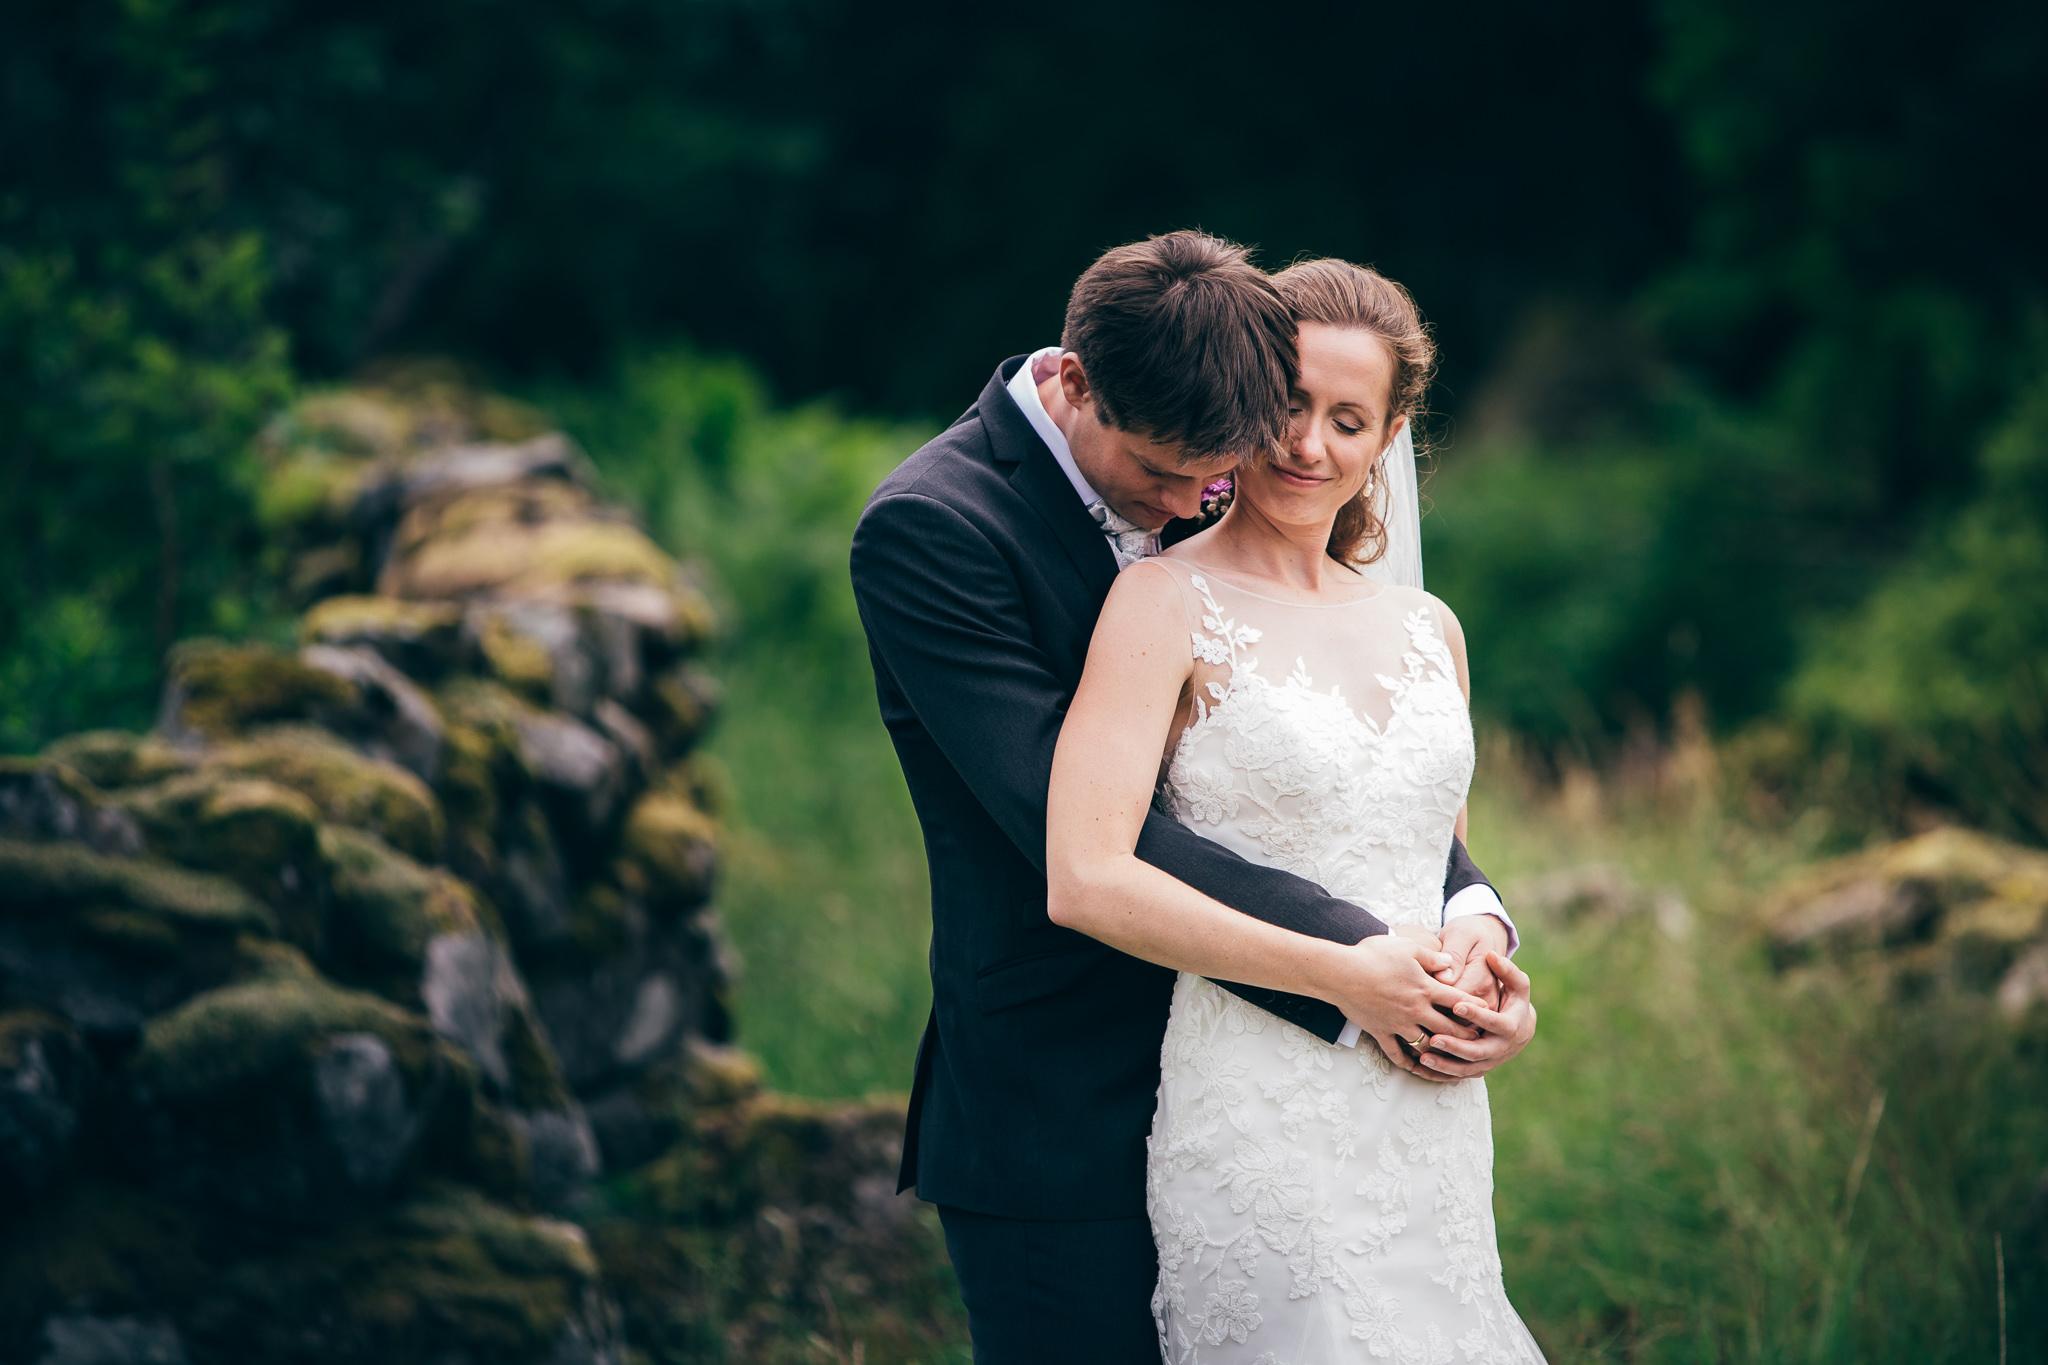 Norway+wedding+photographer+elopement+pre+wedding+Rogaland+bryllupsfotograf+Casey+Arneson-86.jpg